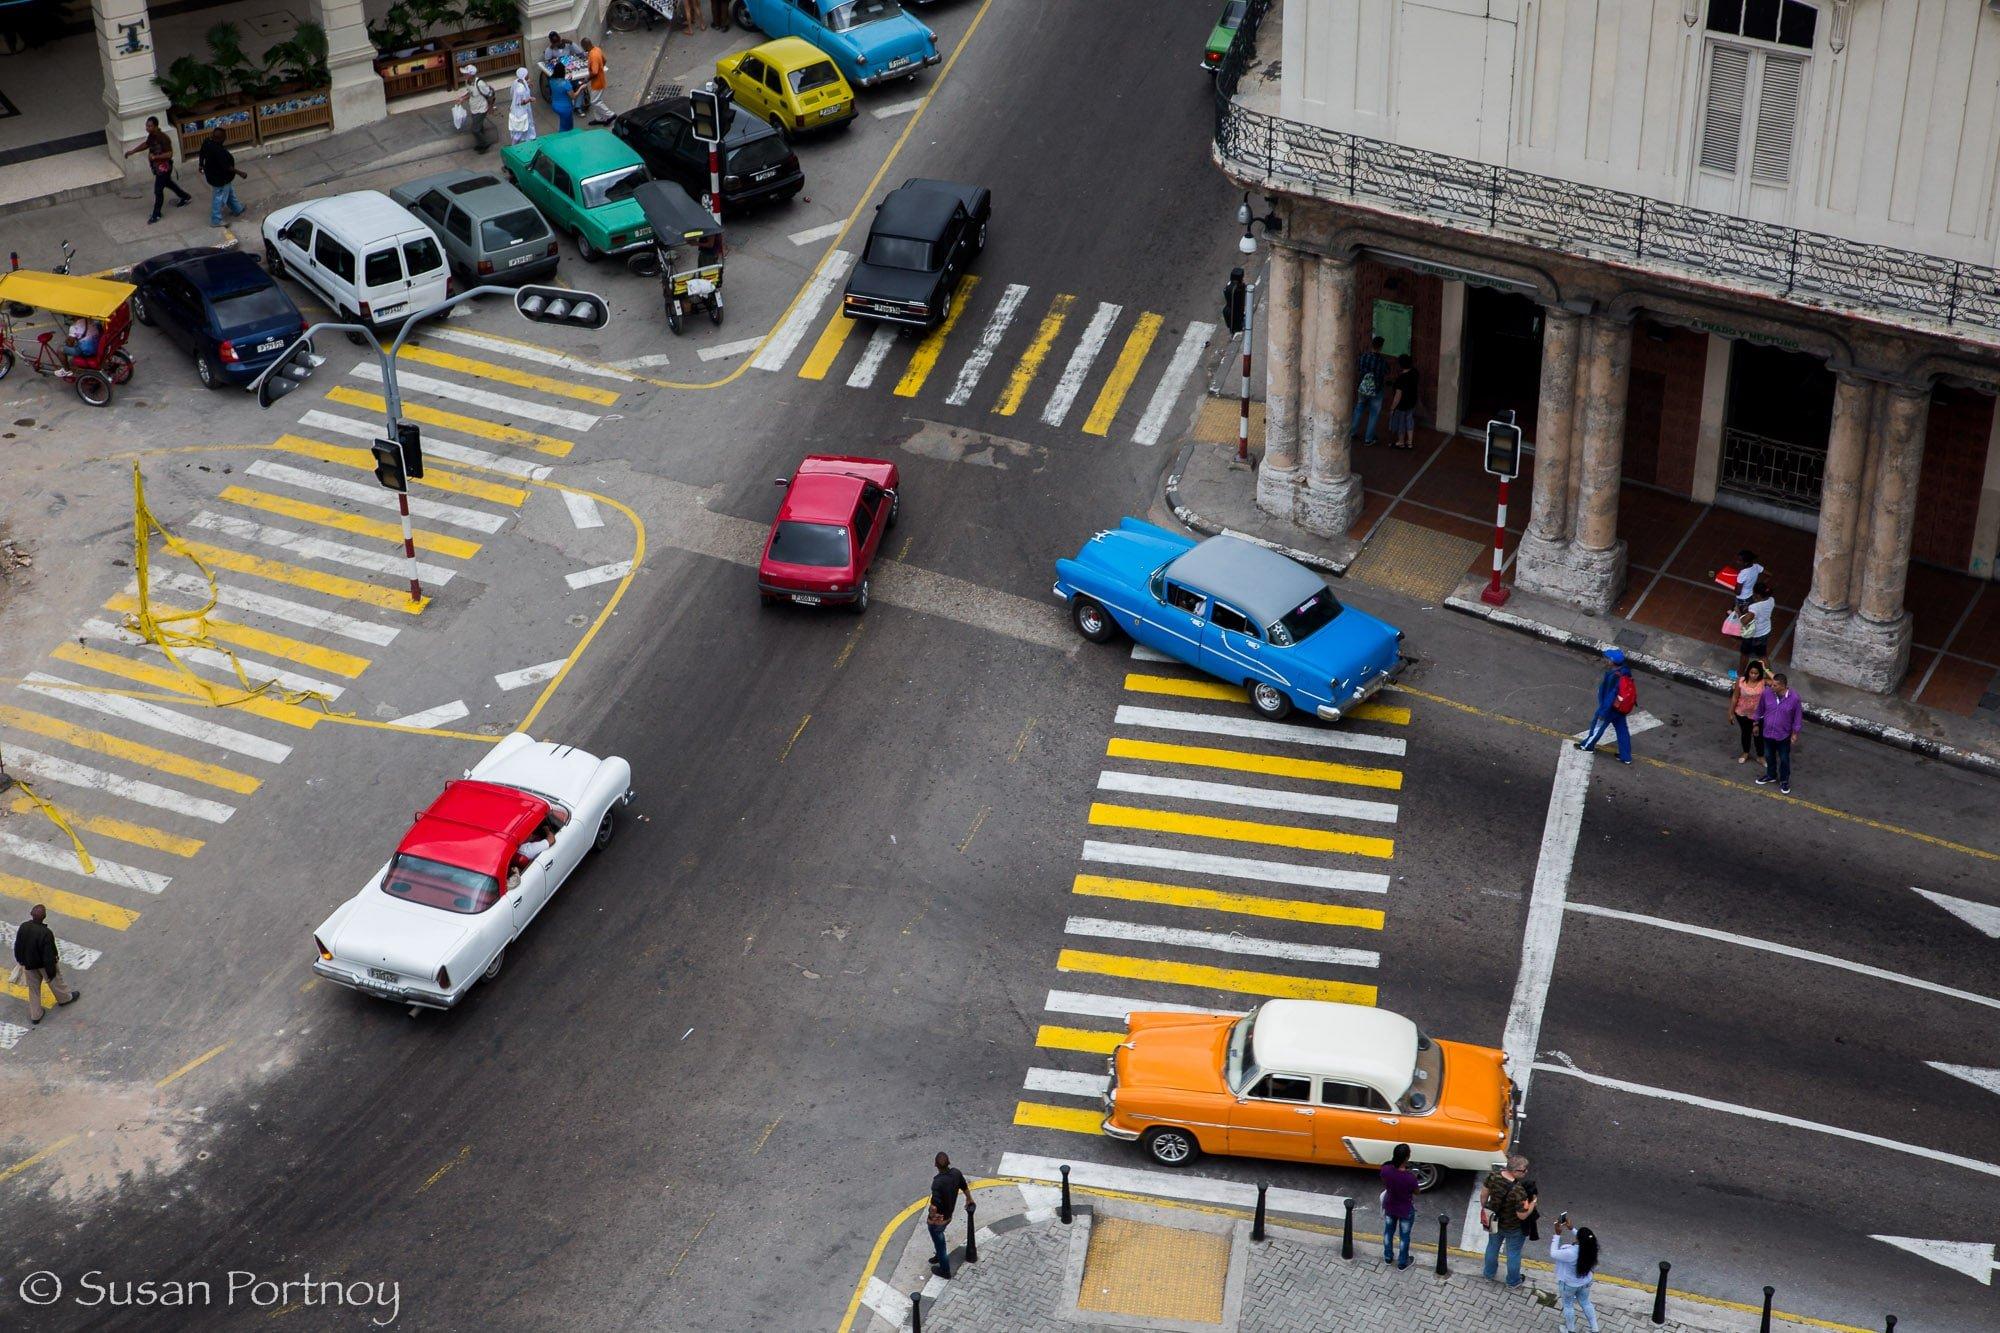 Colorful classic cars in Havana, Cuba